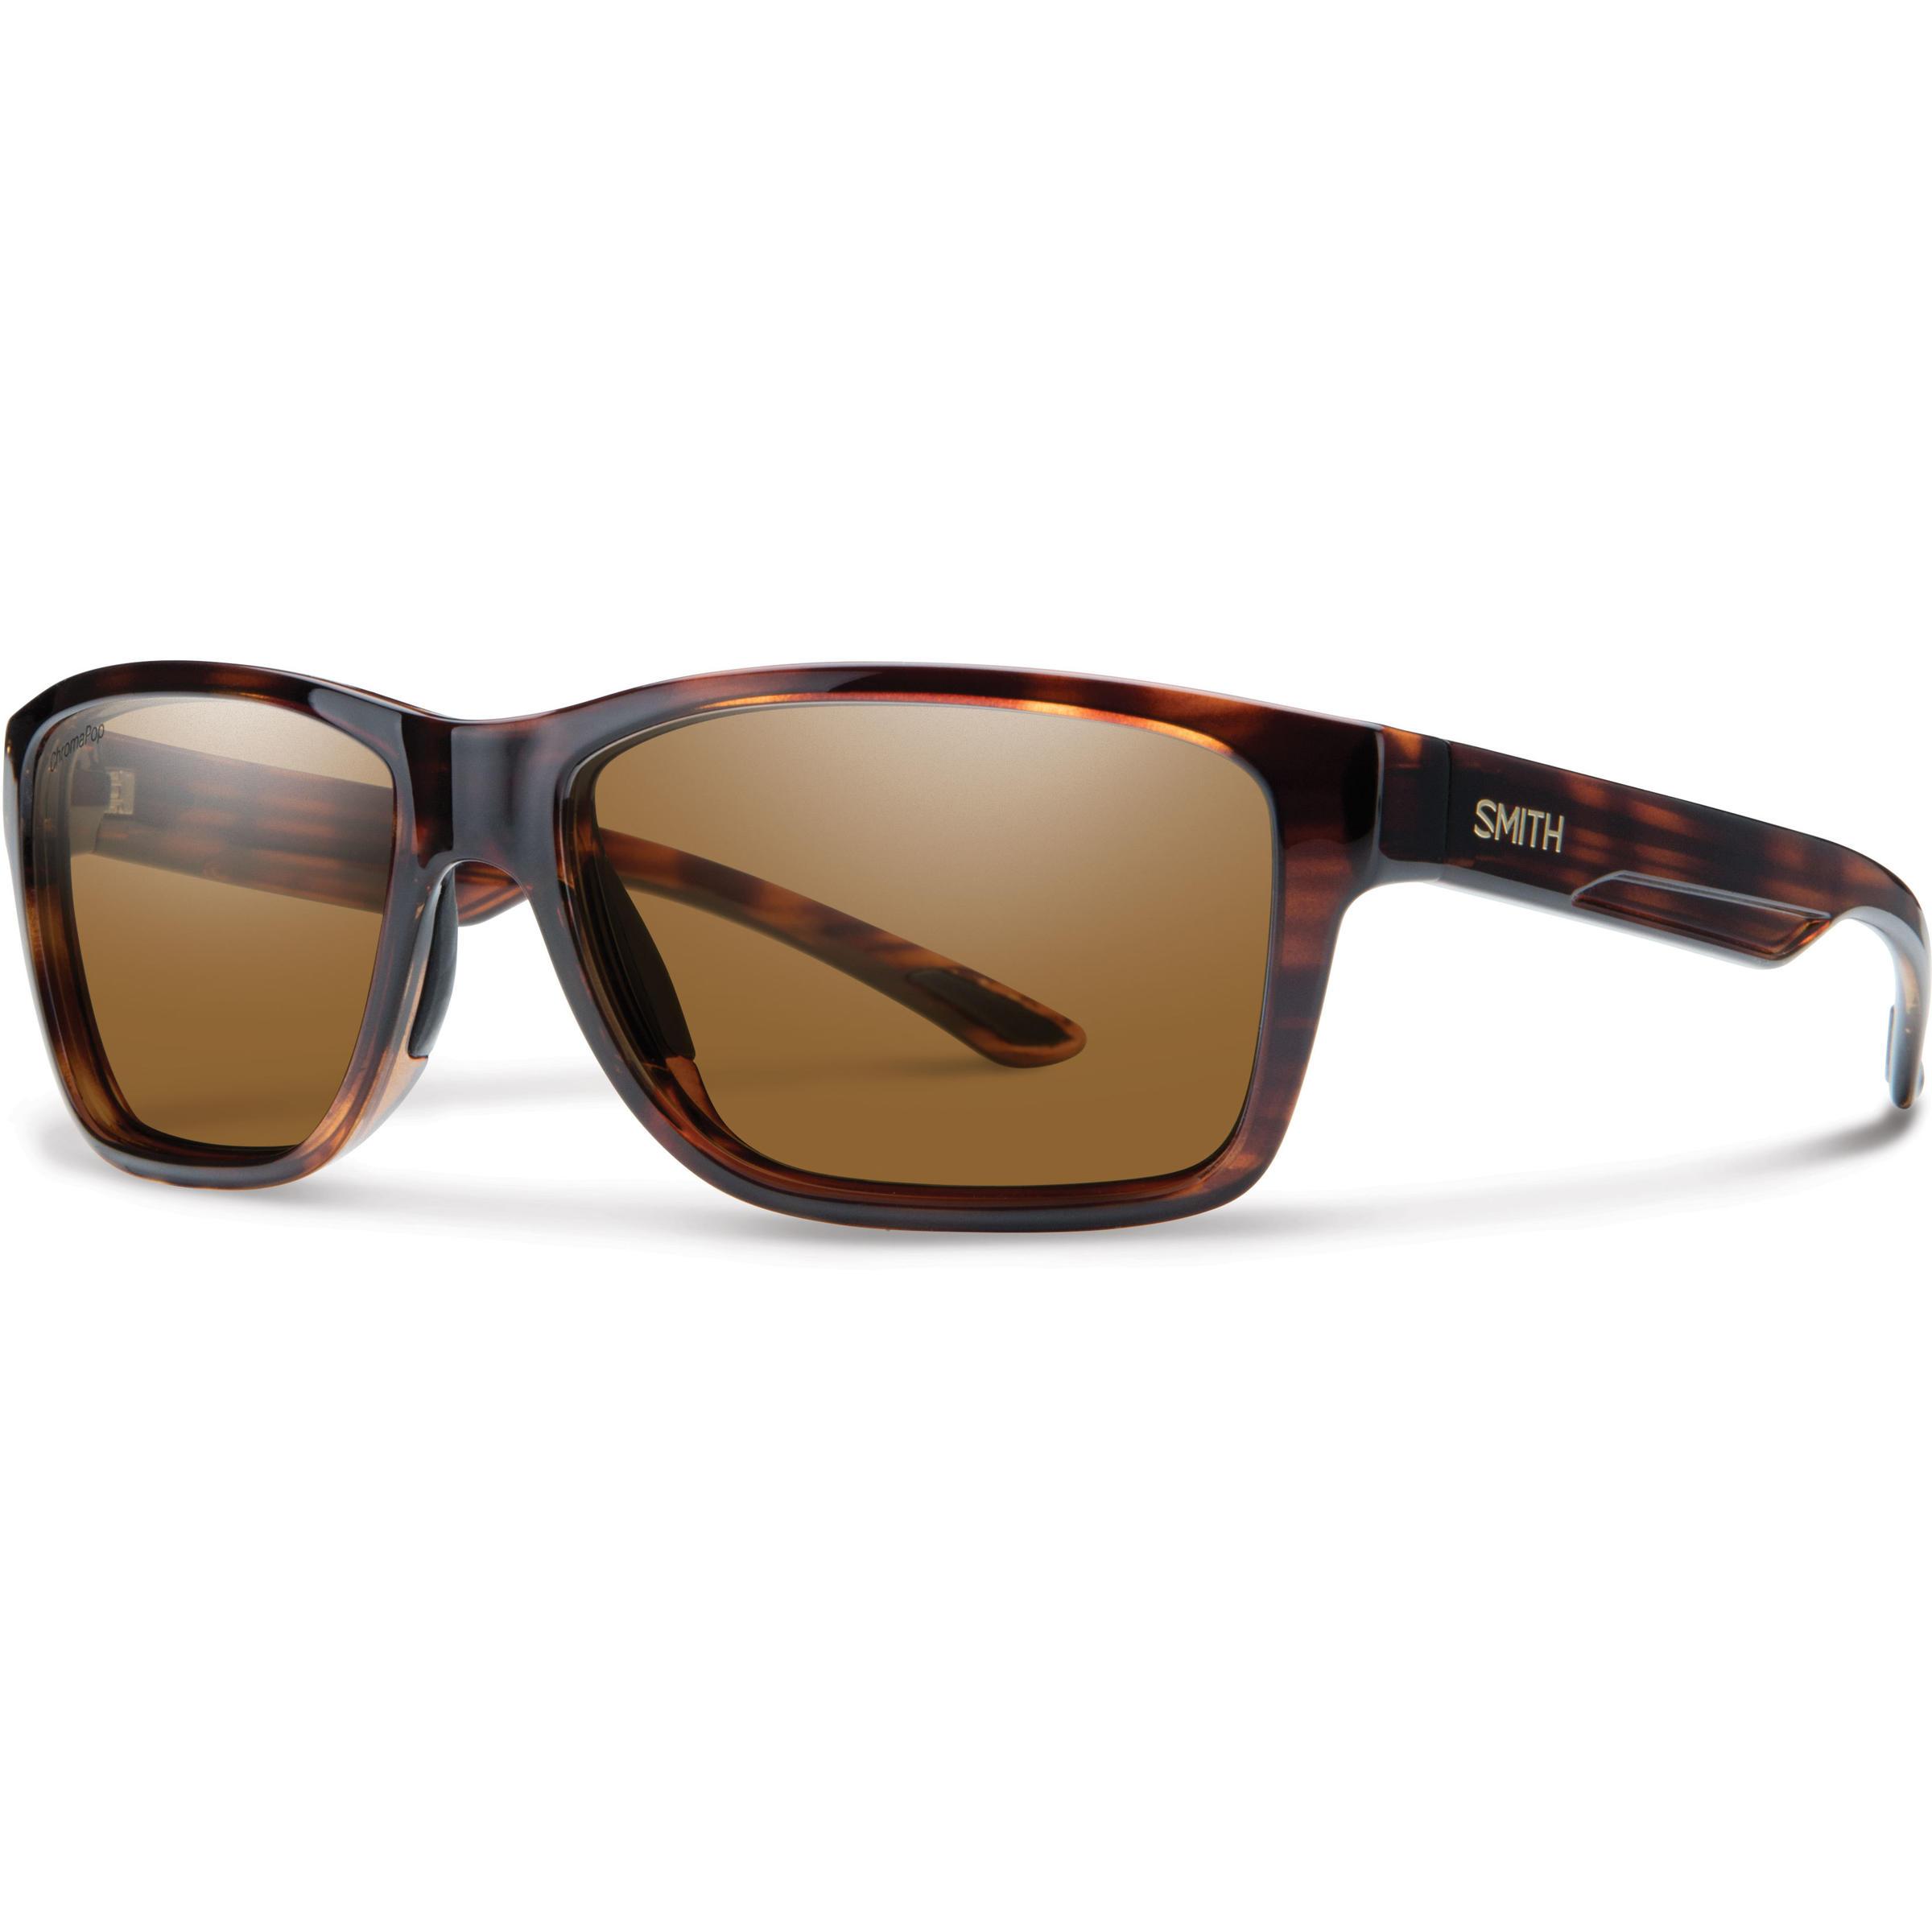 Tortoise Smith Wolcott ChromaPop Brown Lens Polarized Sunglasses